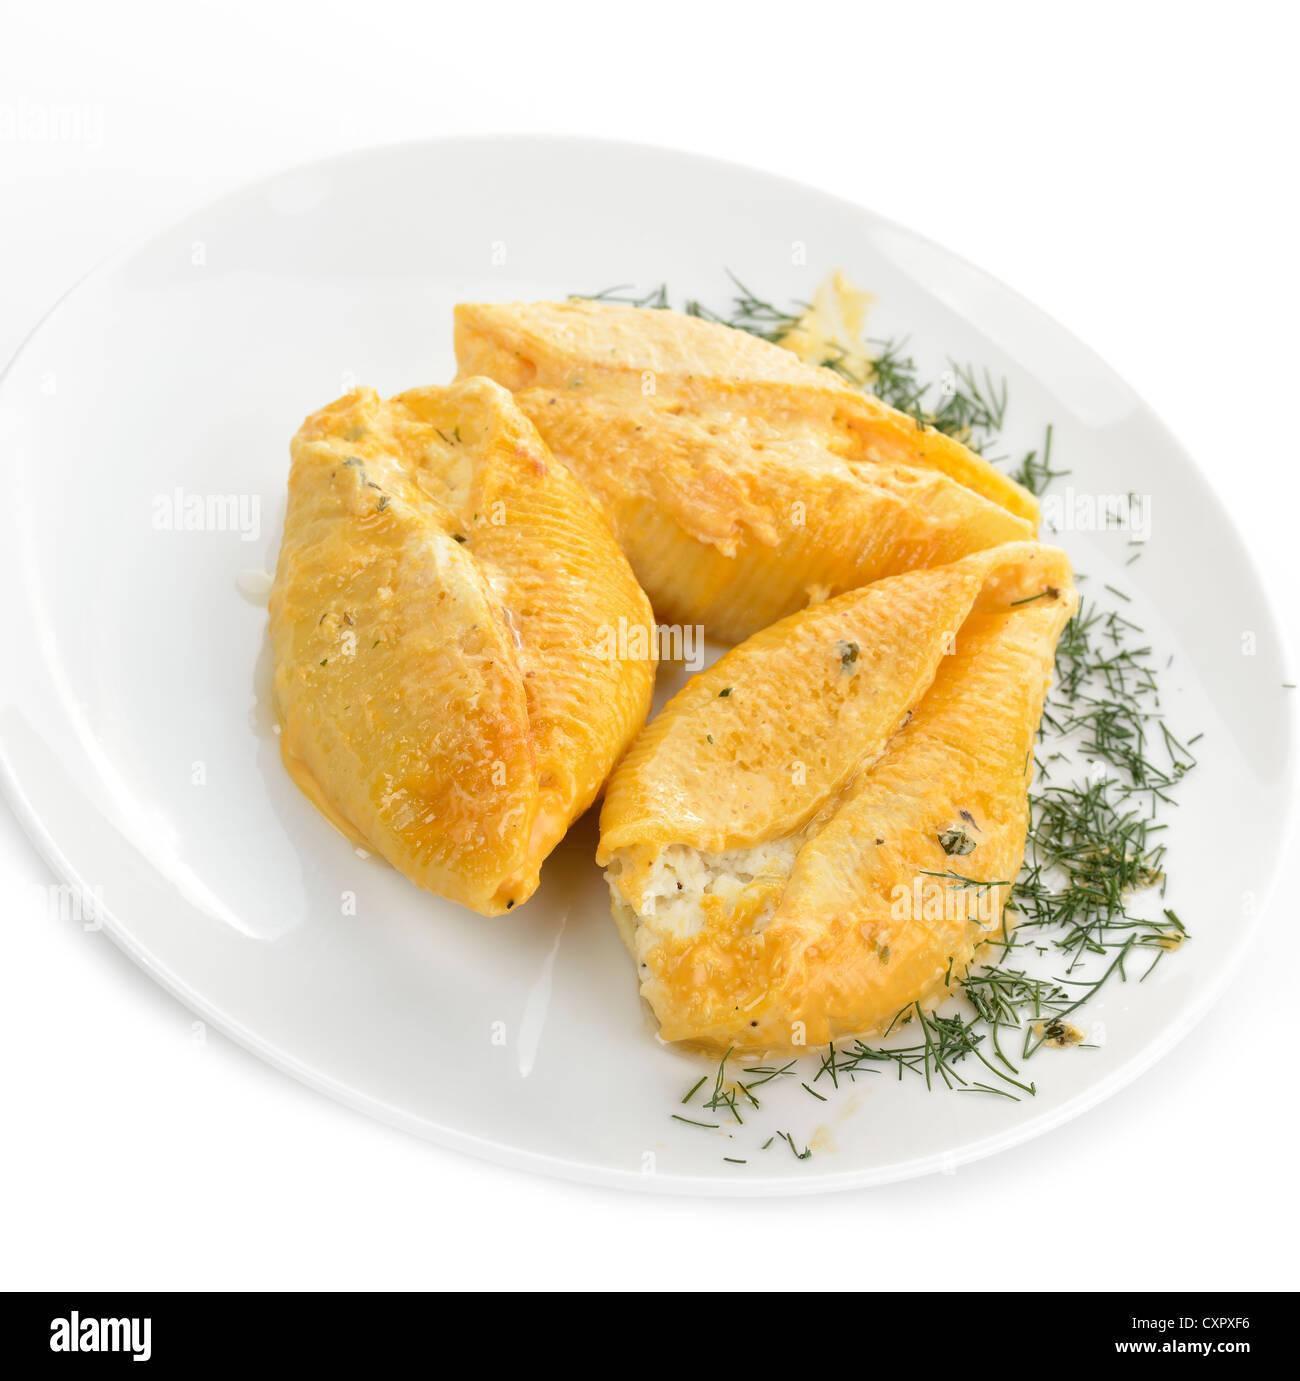 Großen Pasta Shells gefüllt mit Ricotta, Mozzarella und Parmesan-Käse. Stockbild